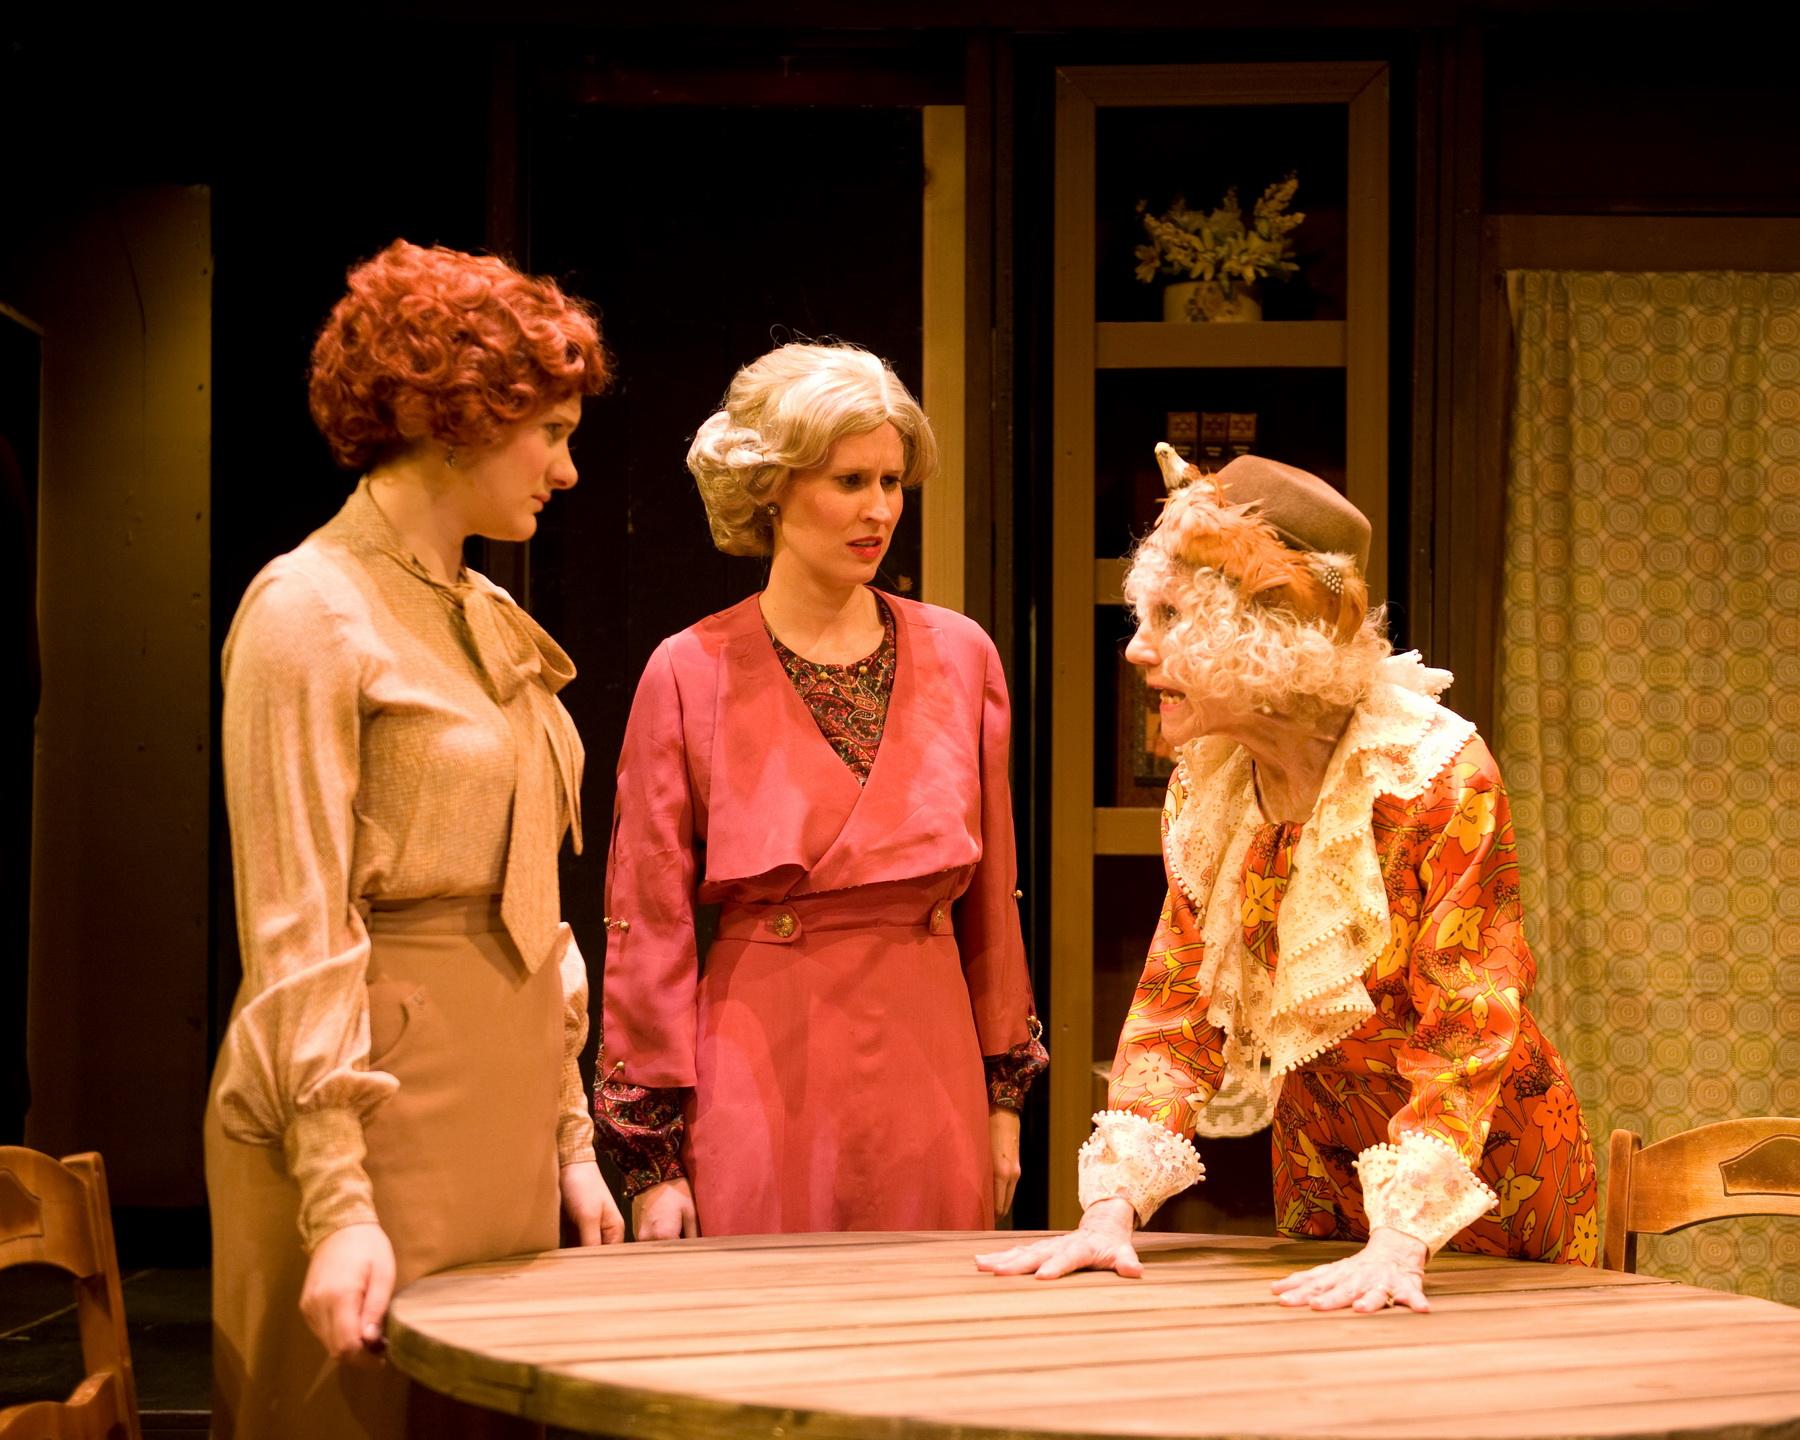 Monica Zach as Mavis Wilson, Jill Kenderes as Cecily Harrington and Marcia Mandell as Louise Garrard (Aunt Lou Lou)